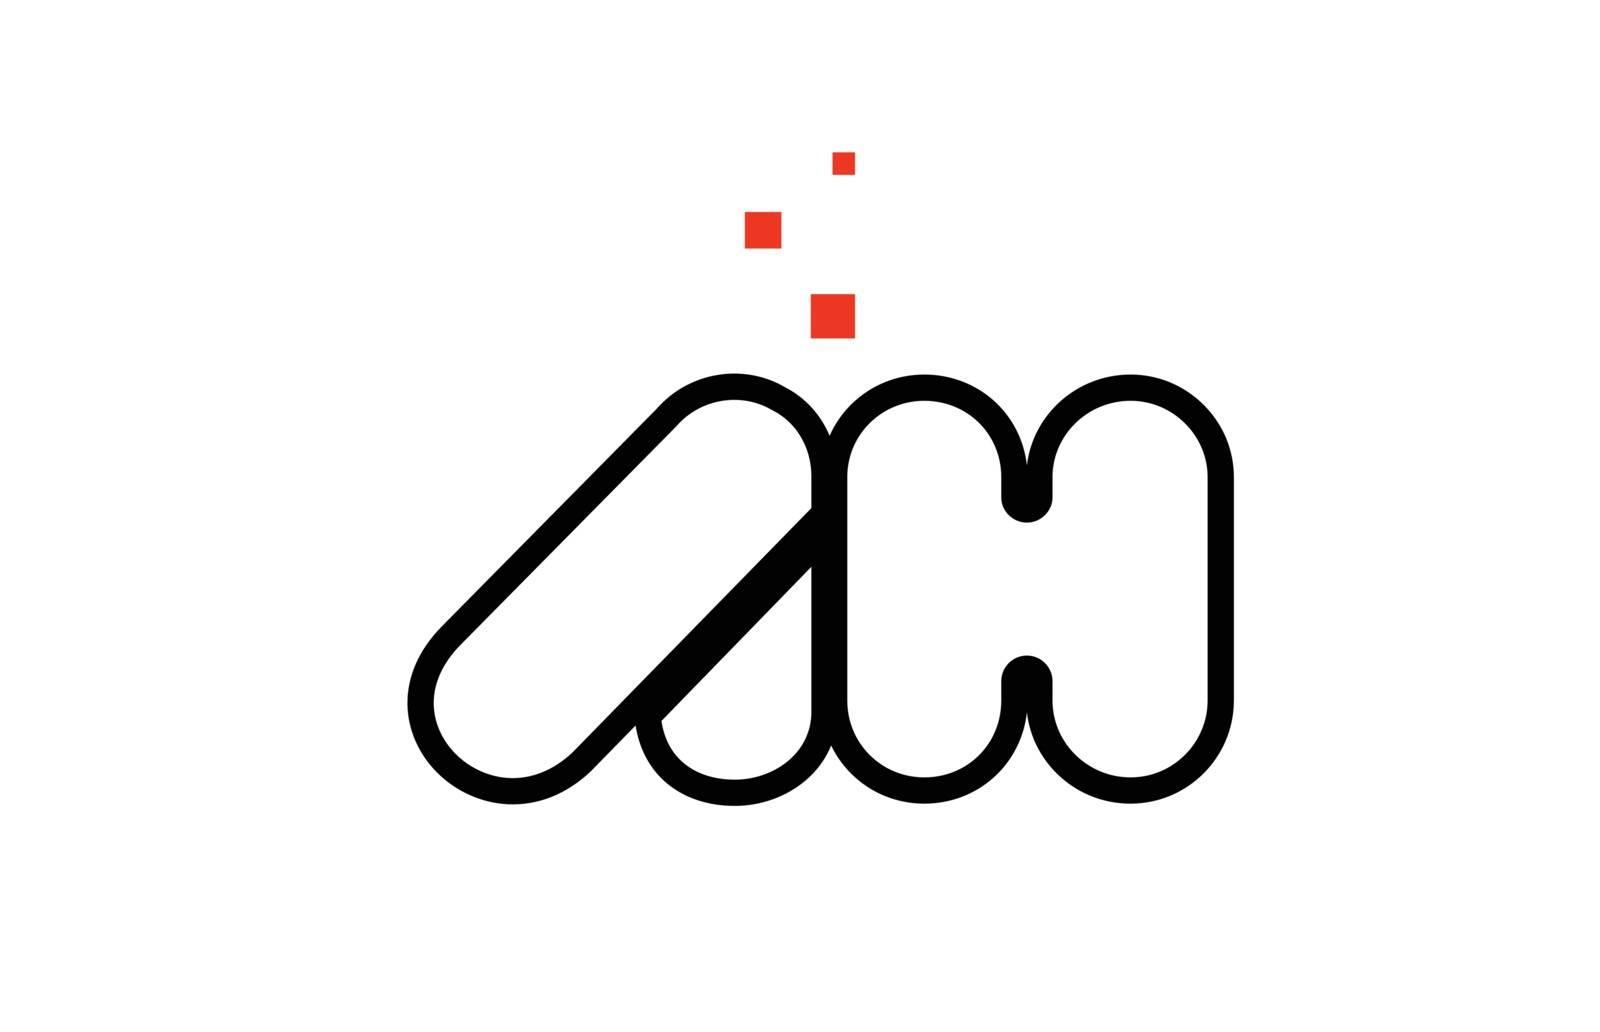 AH A H black white red alphabet letter combination logo icon des by dragomirescu